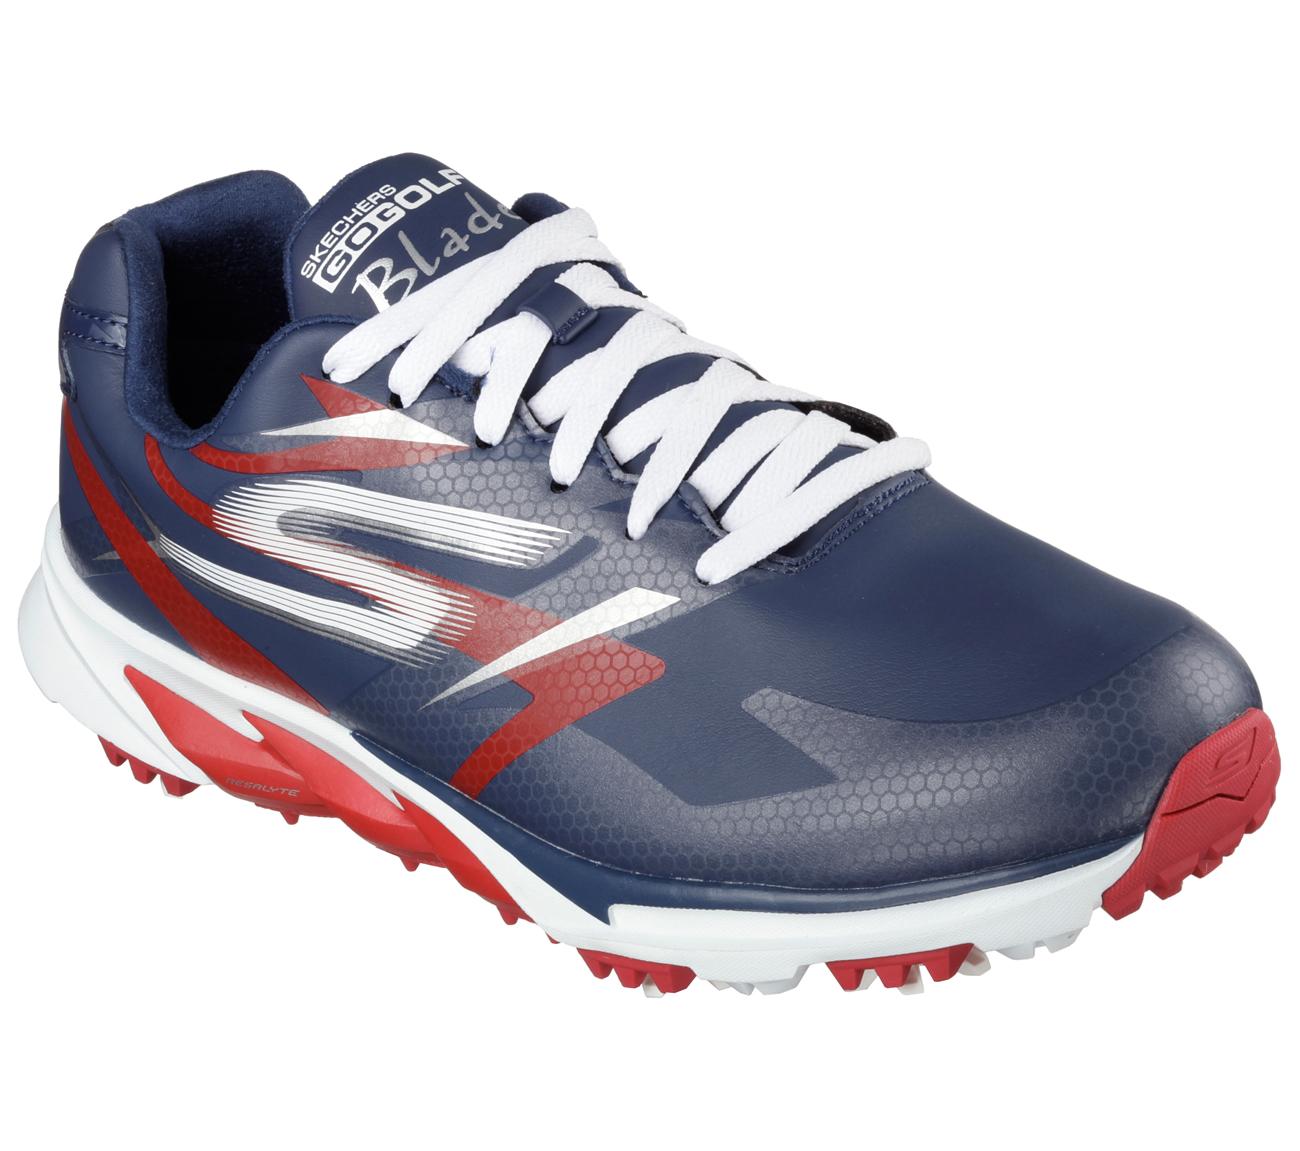 Skechers Go Golf Blade Hydrom Golf Shoes